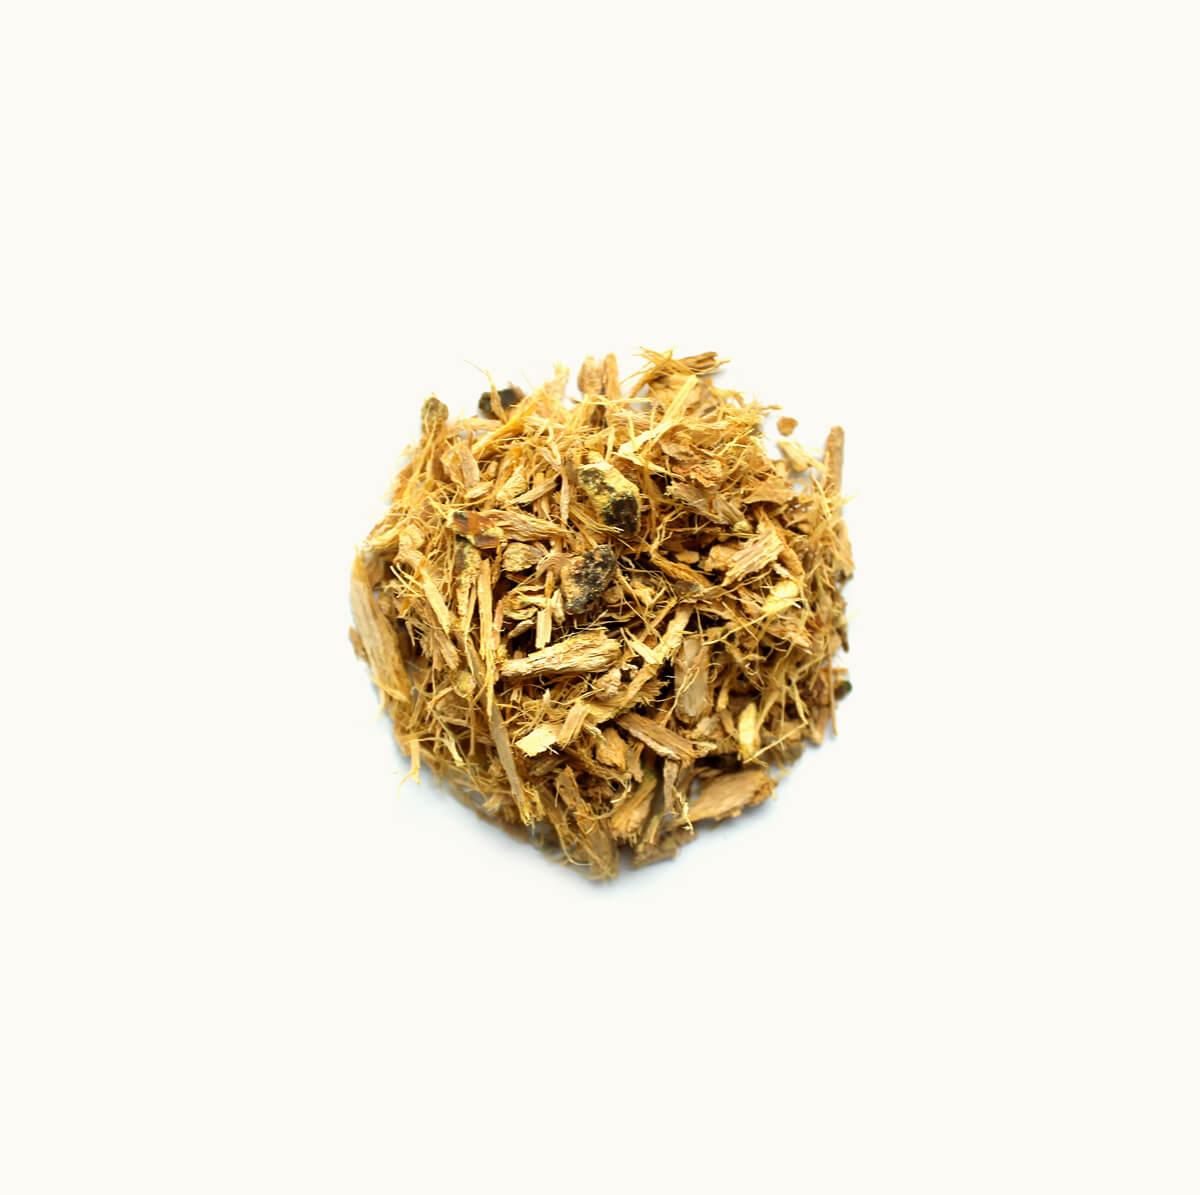 MULUNGU - Erythrina mulungu - 30g